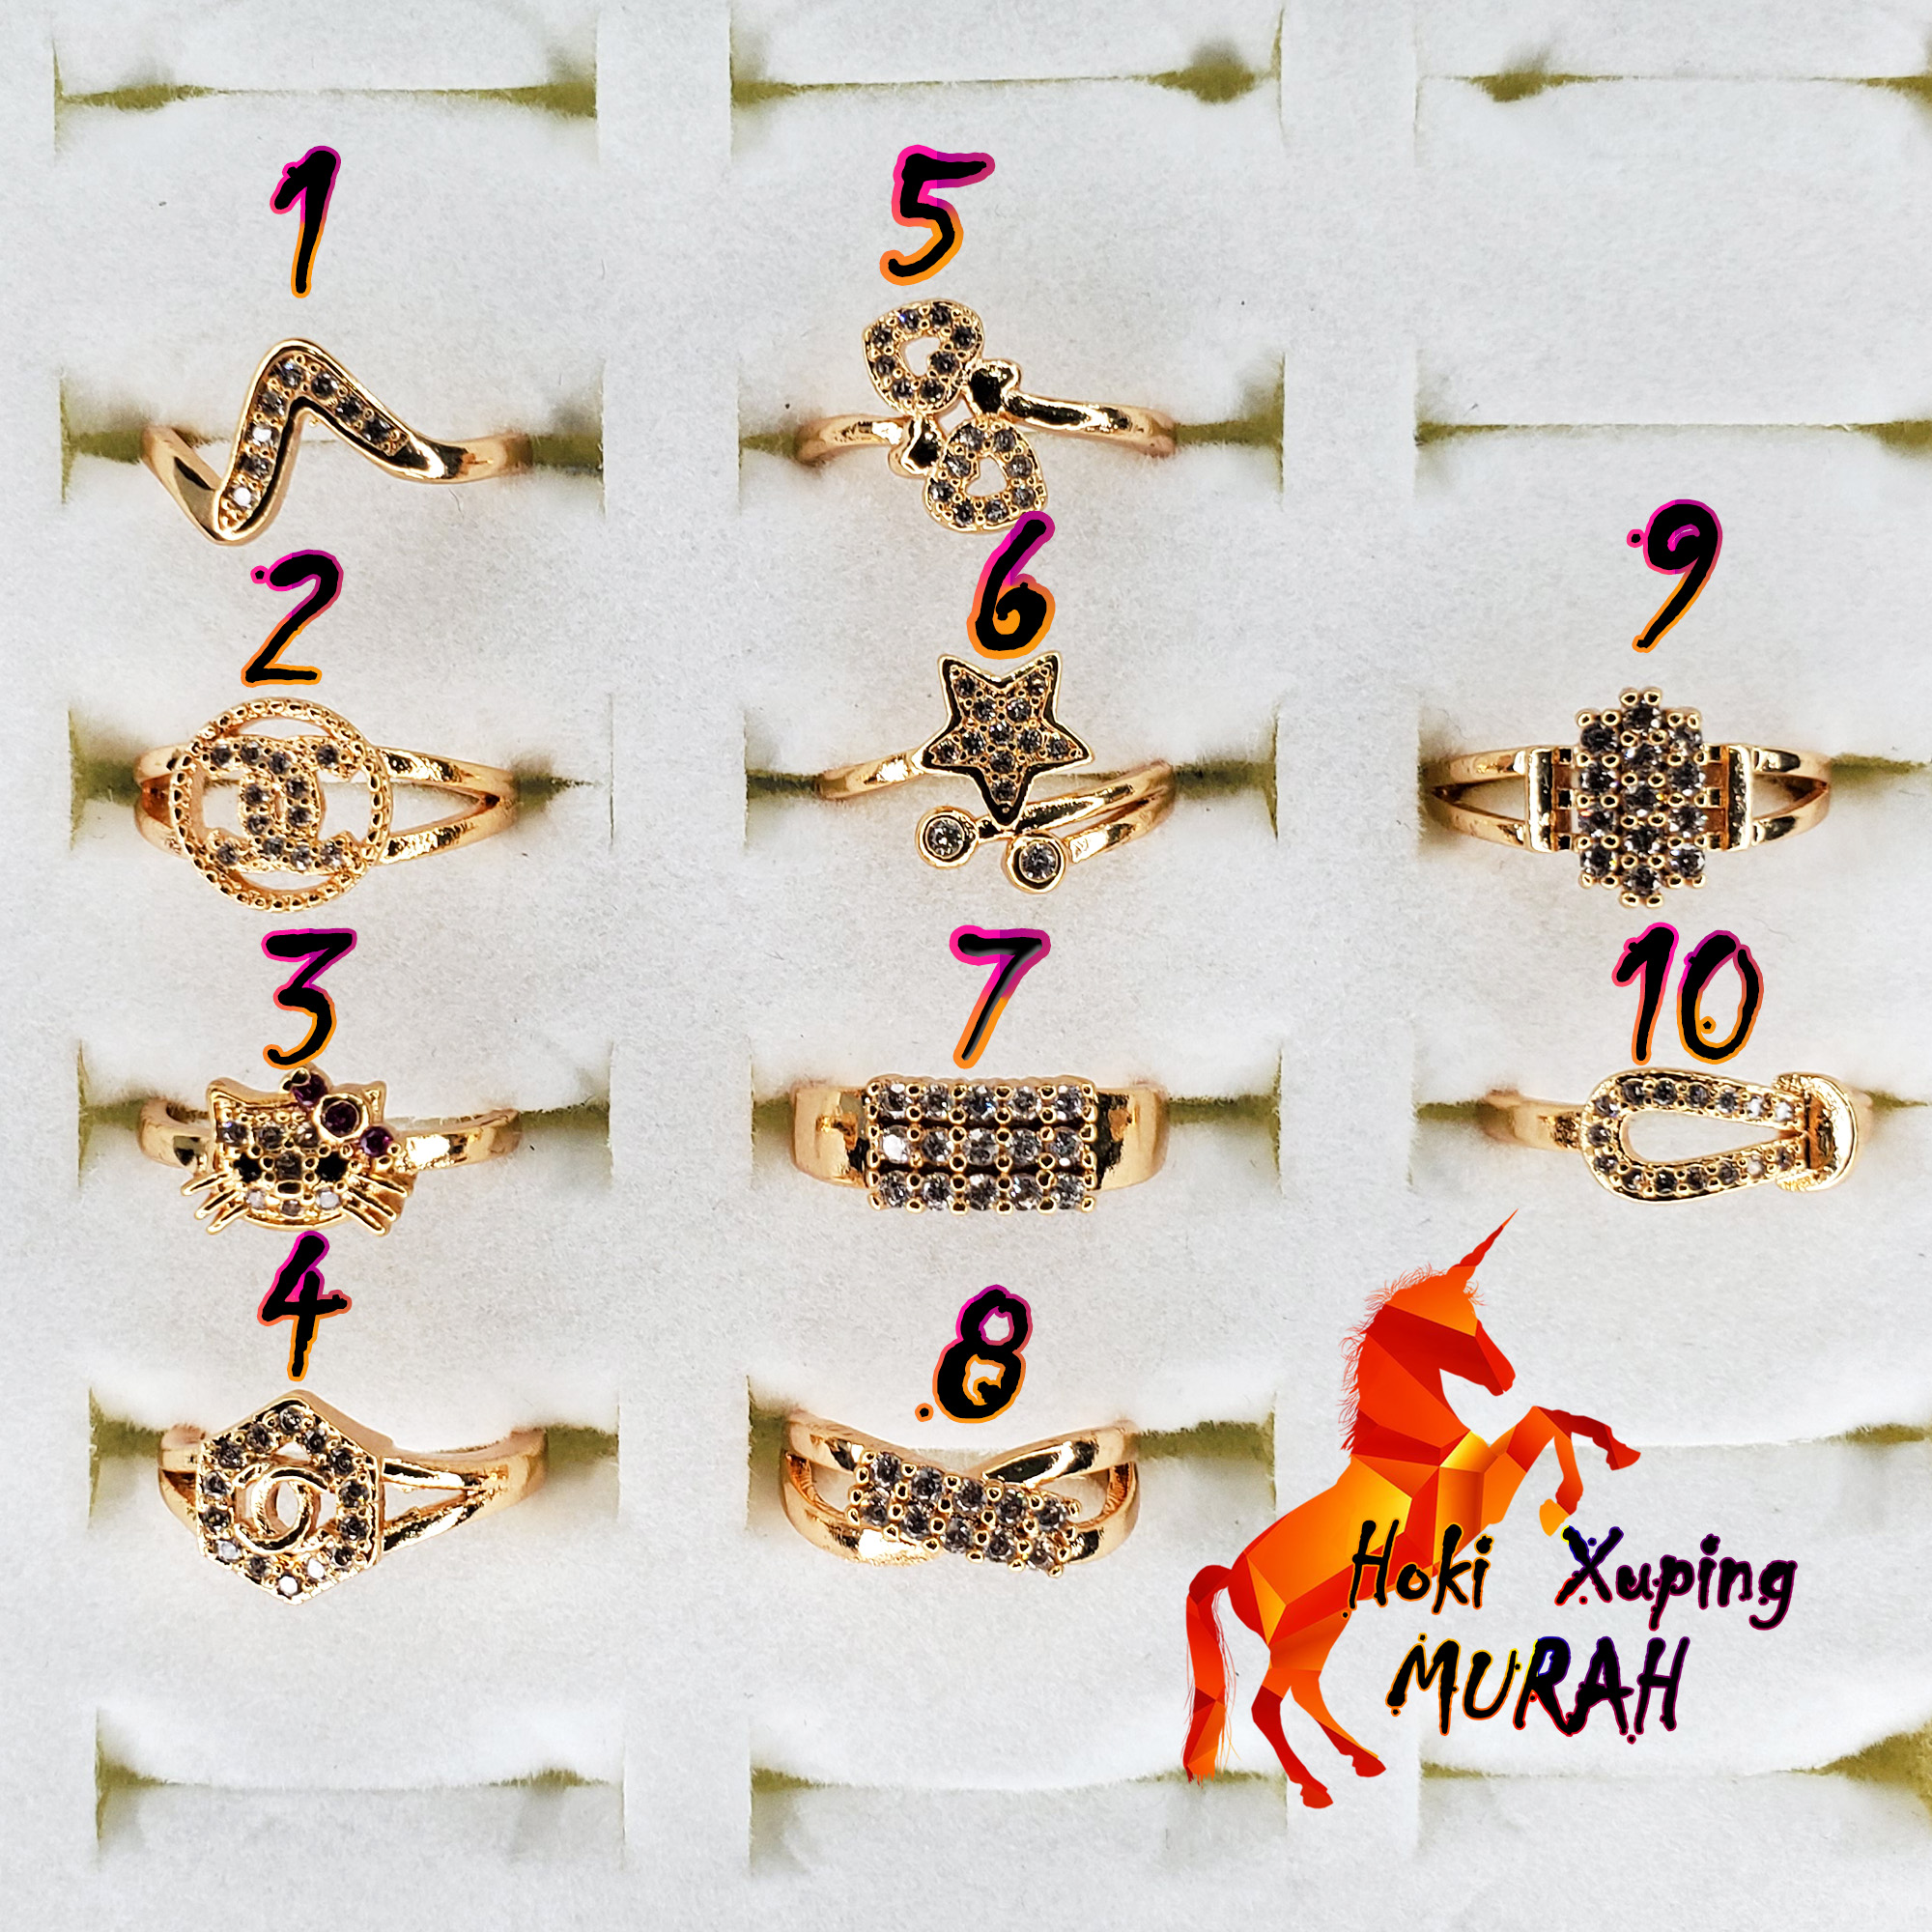 cincin anak permata motif random / perhiasan anak / xuping anak